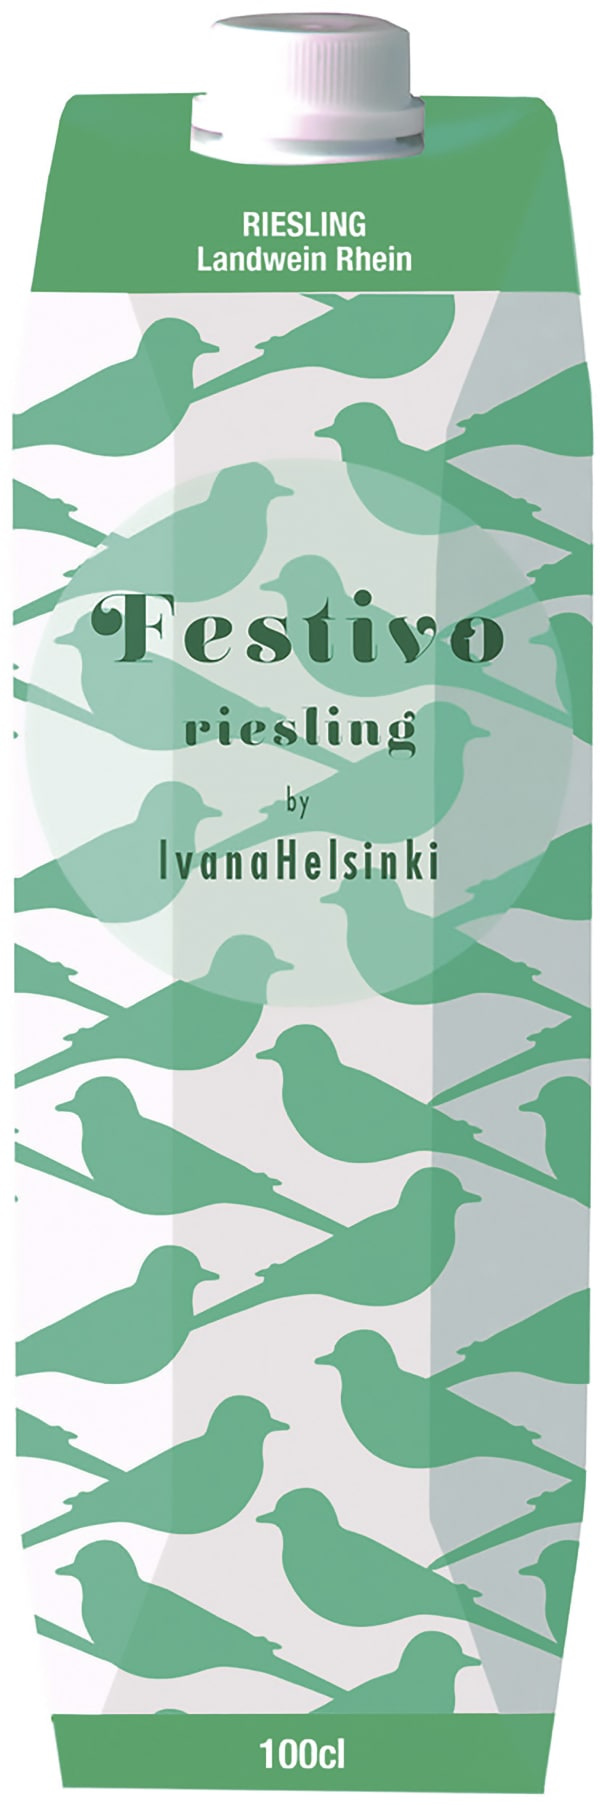 Festivo Riesling carton package